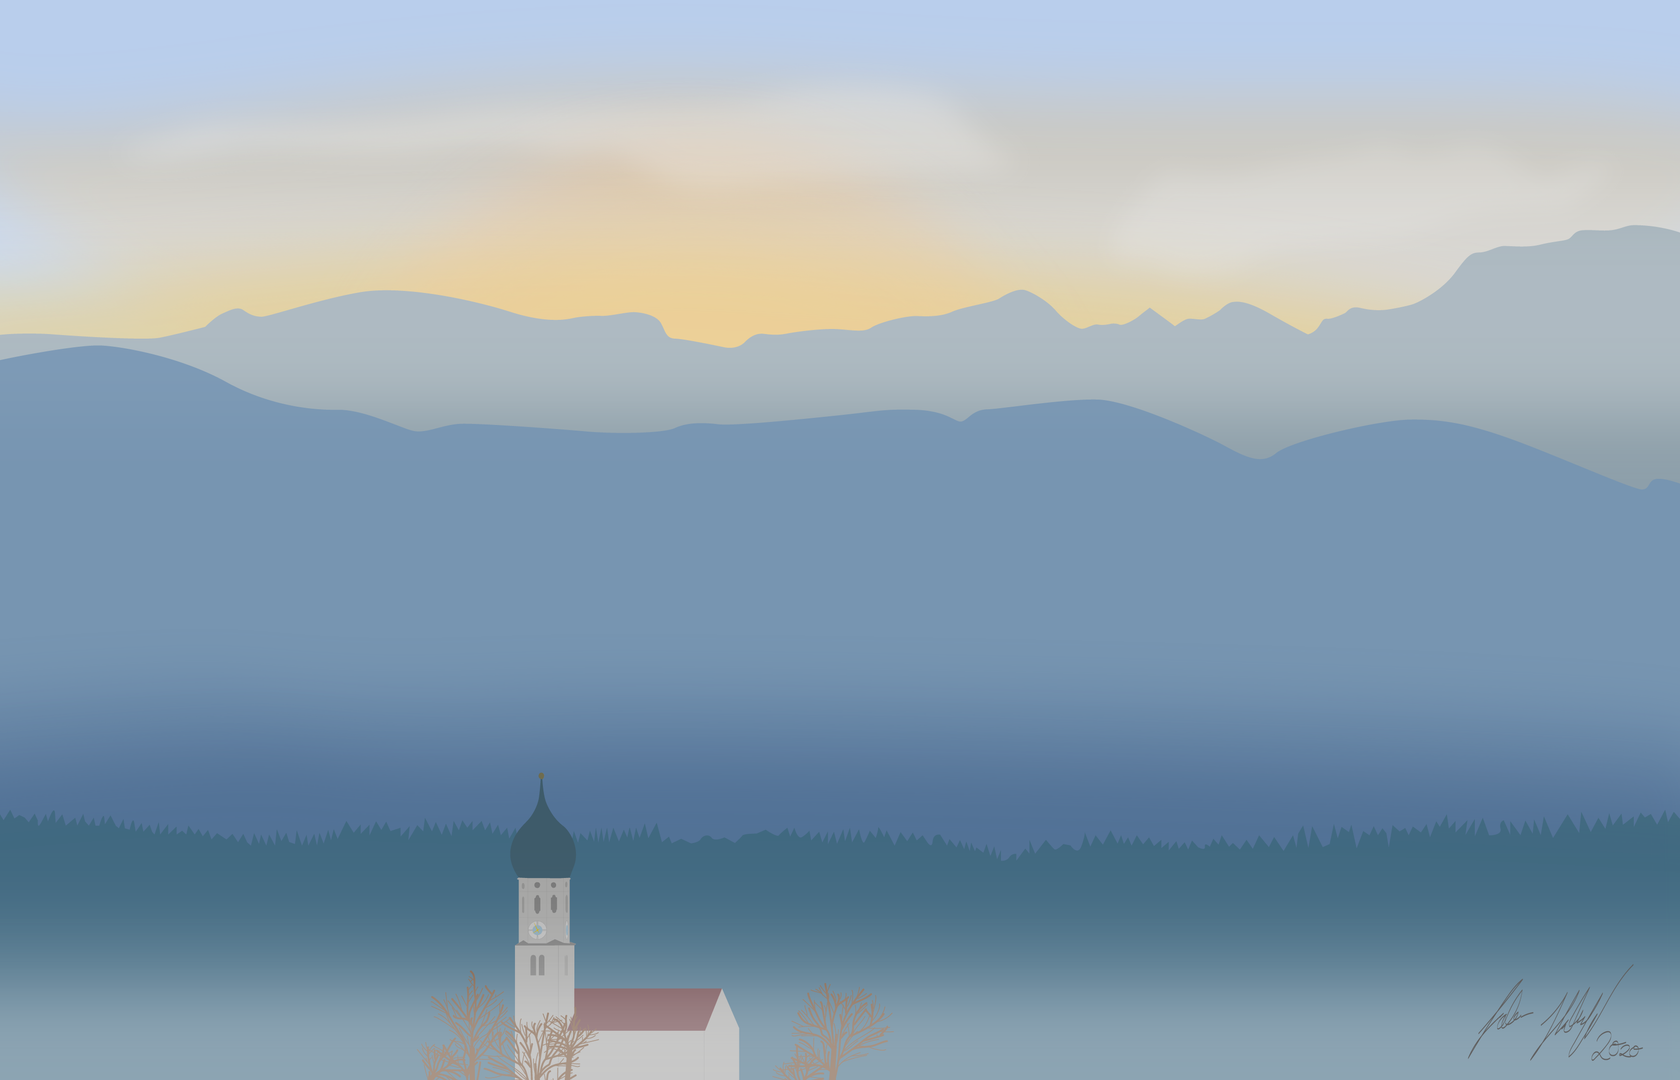 Illustration nach Originalaufnahme